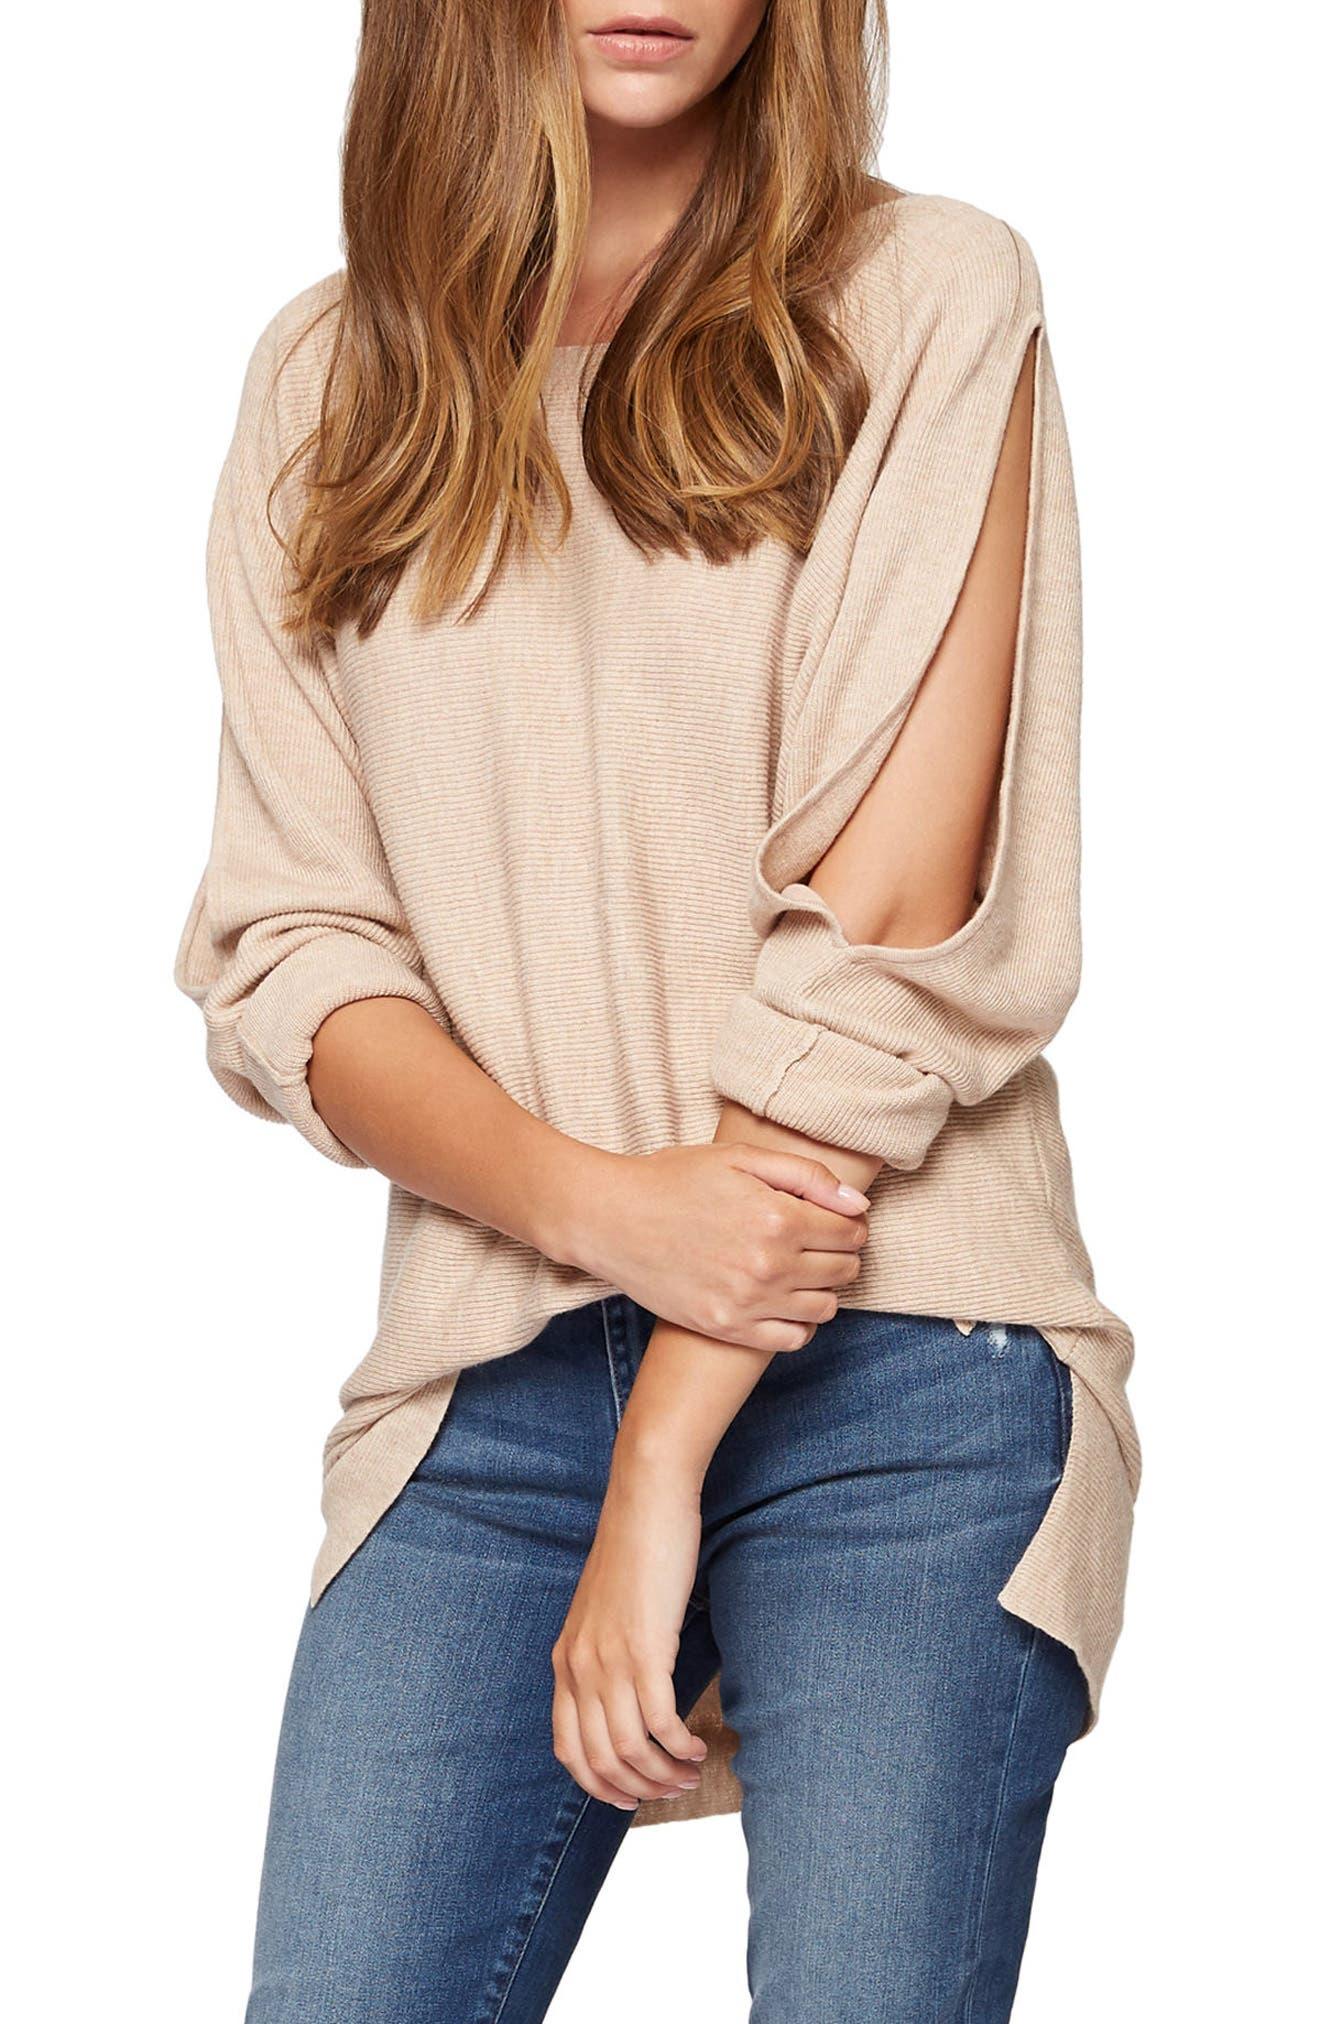 Sancutary Gillian Bare Shoulder Cutout Tunic Sweater,                             Main thumbnail 1, color,                             259